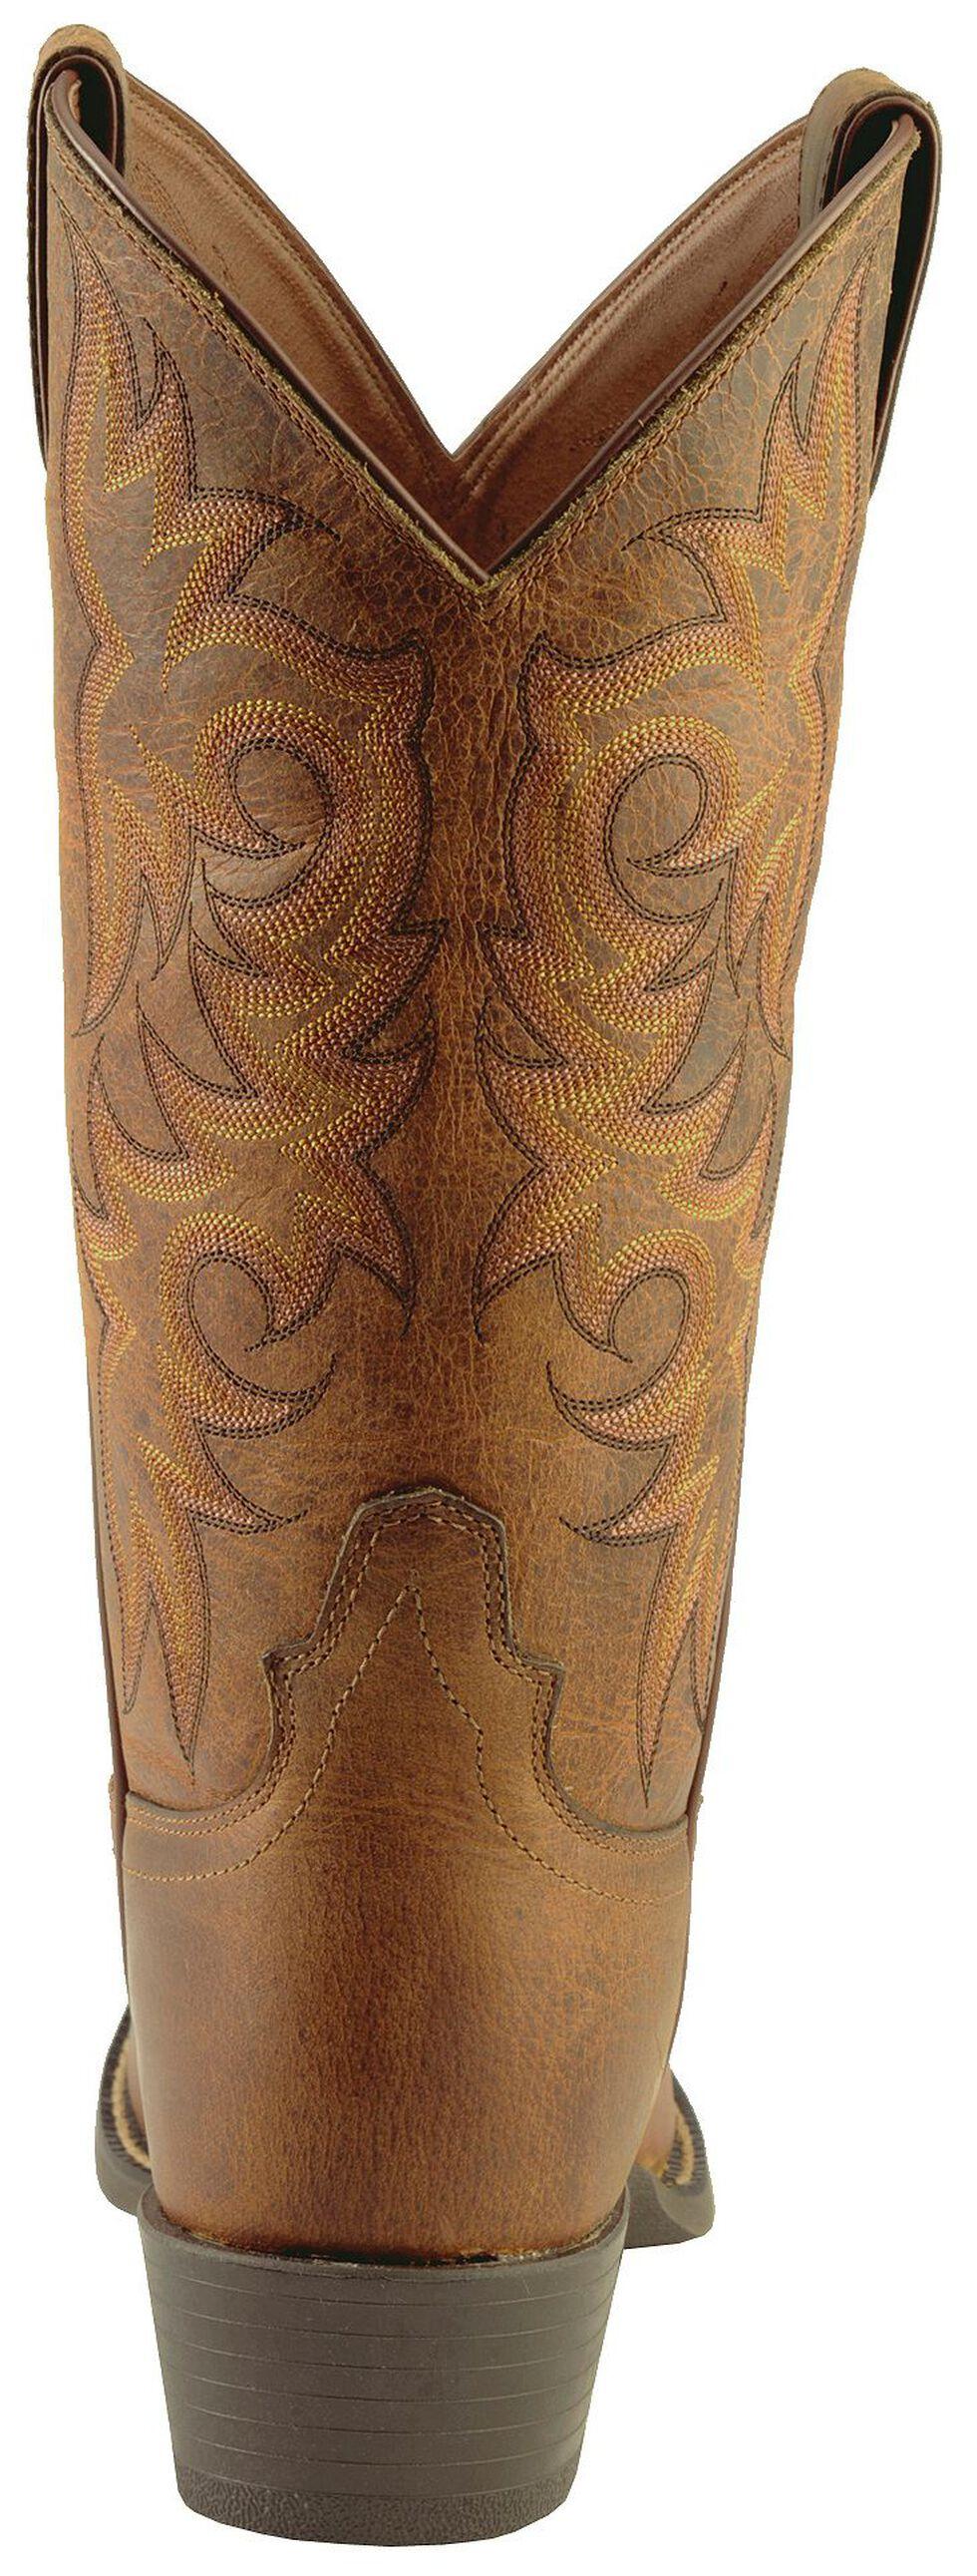 Justin Stampede Western Boots - Medium Toe, Tan, hi-res